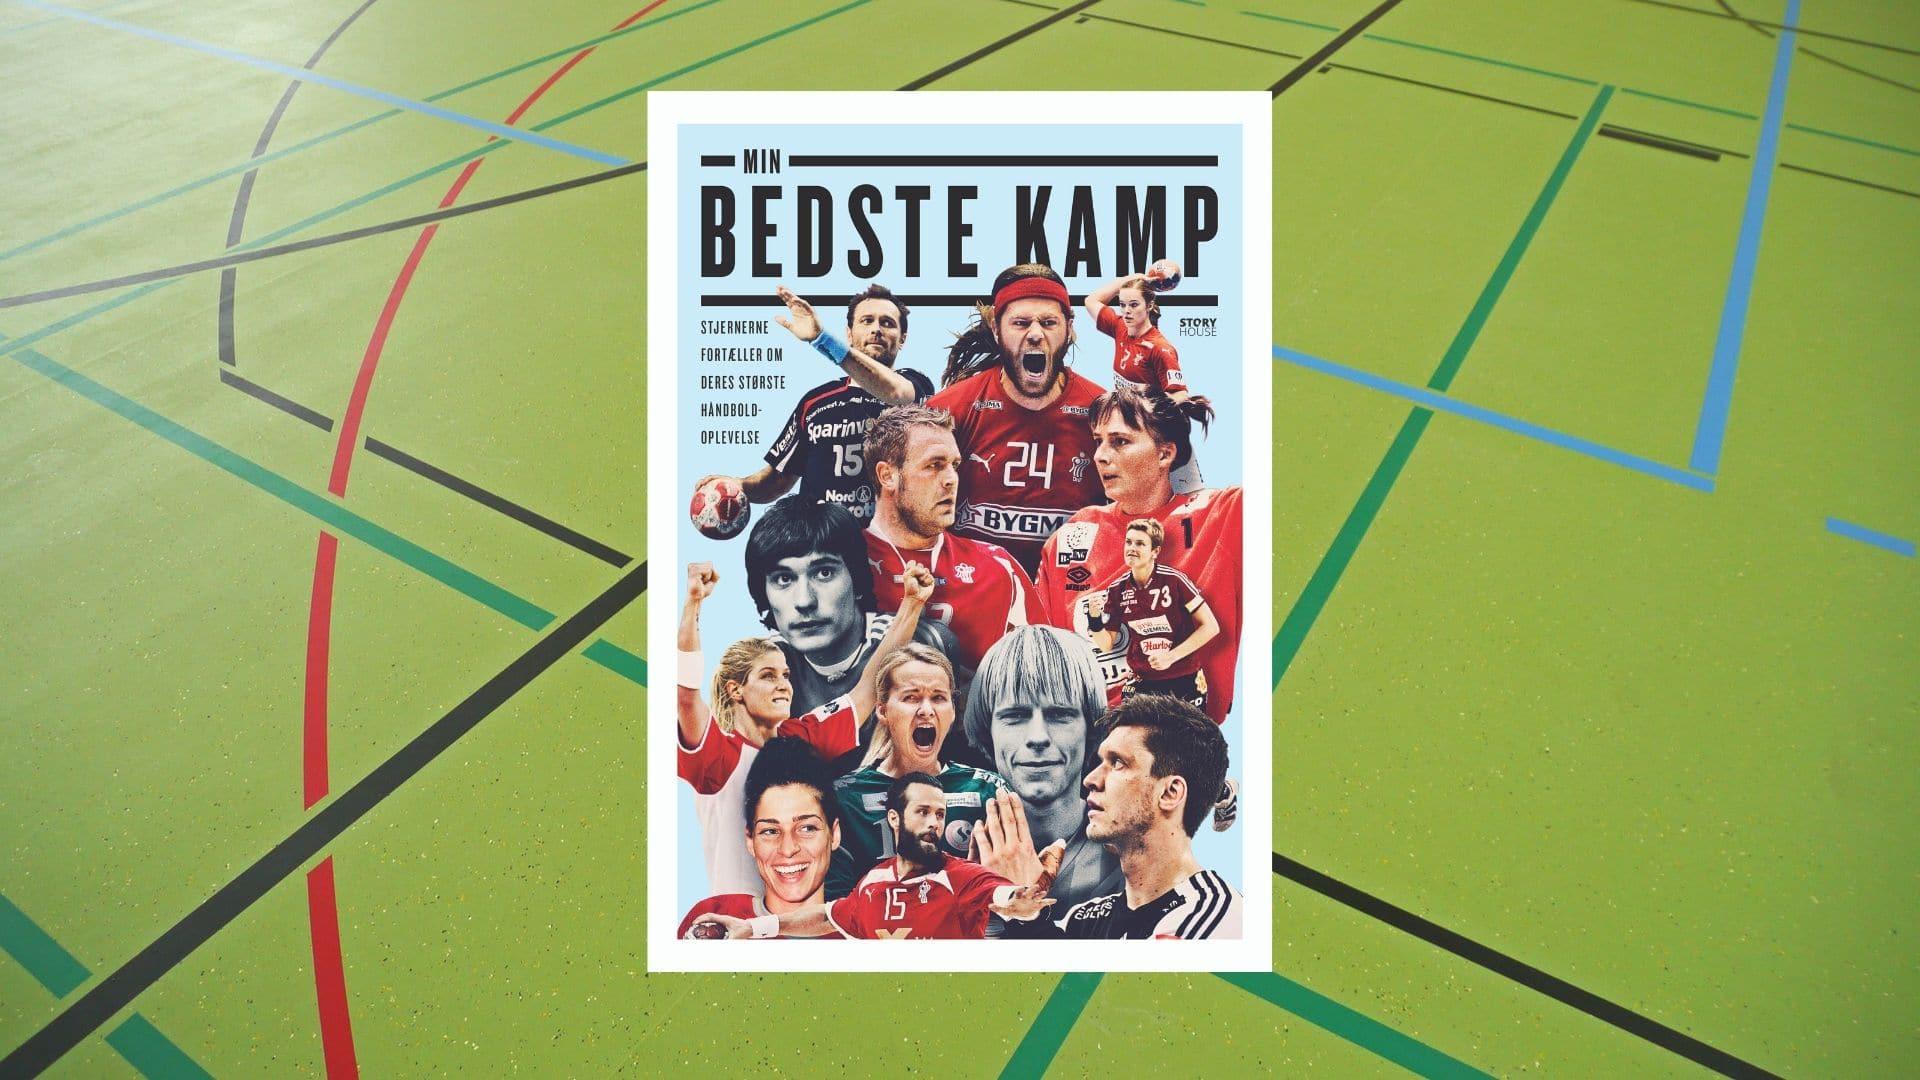 Min bedste kamp, handbold, Jesper Noddesbo, Mikkel Hansen, Niklas Landin